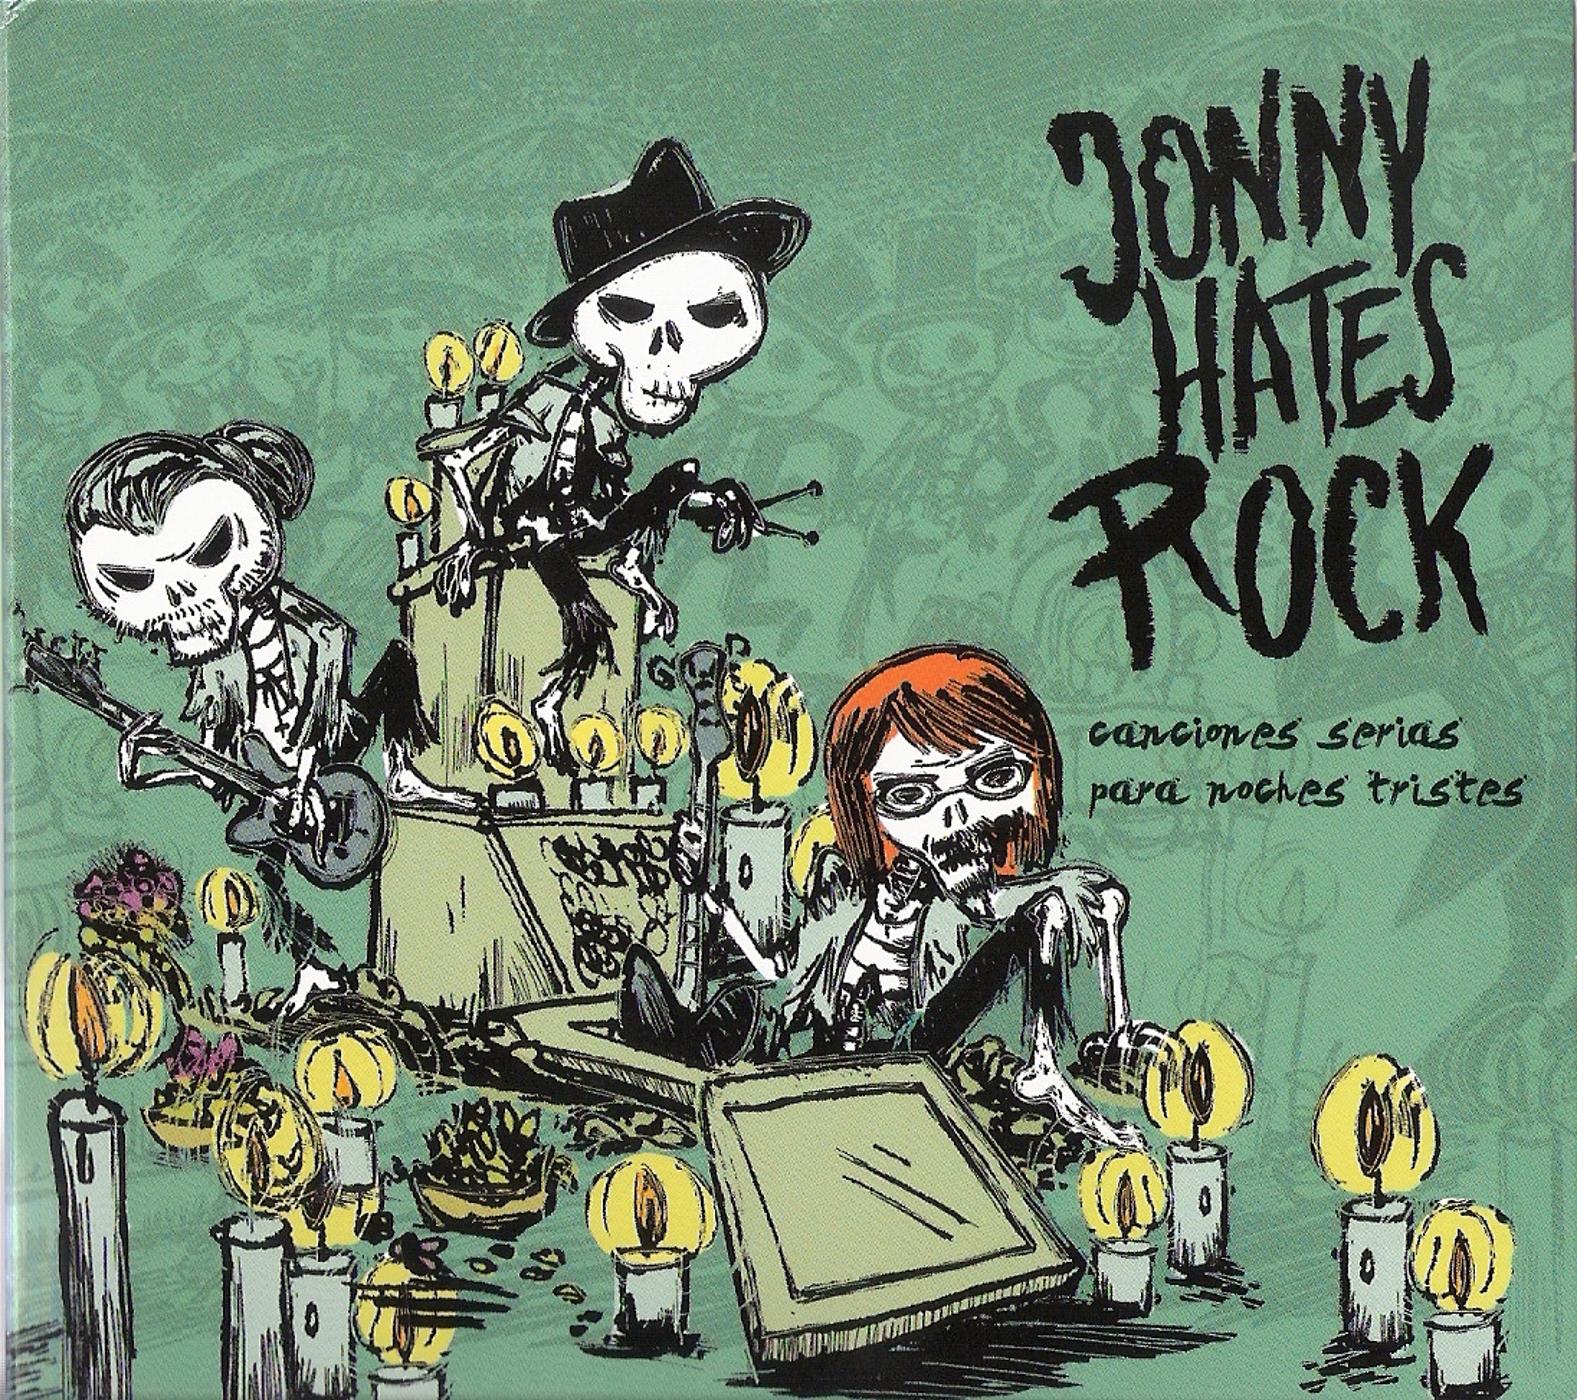 Jonny hates Rock